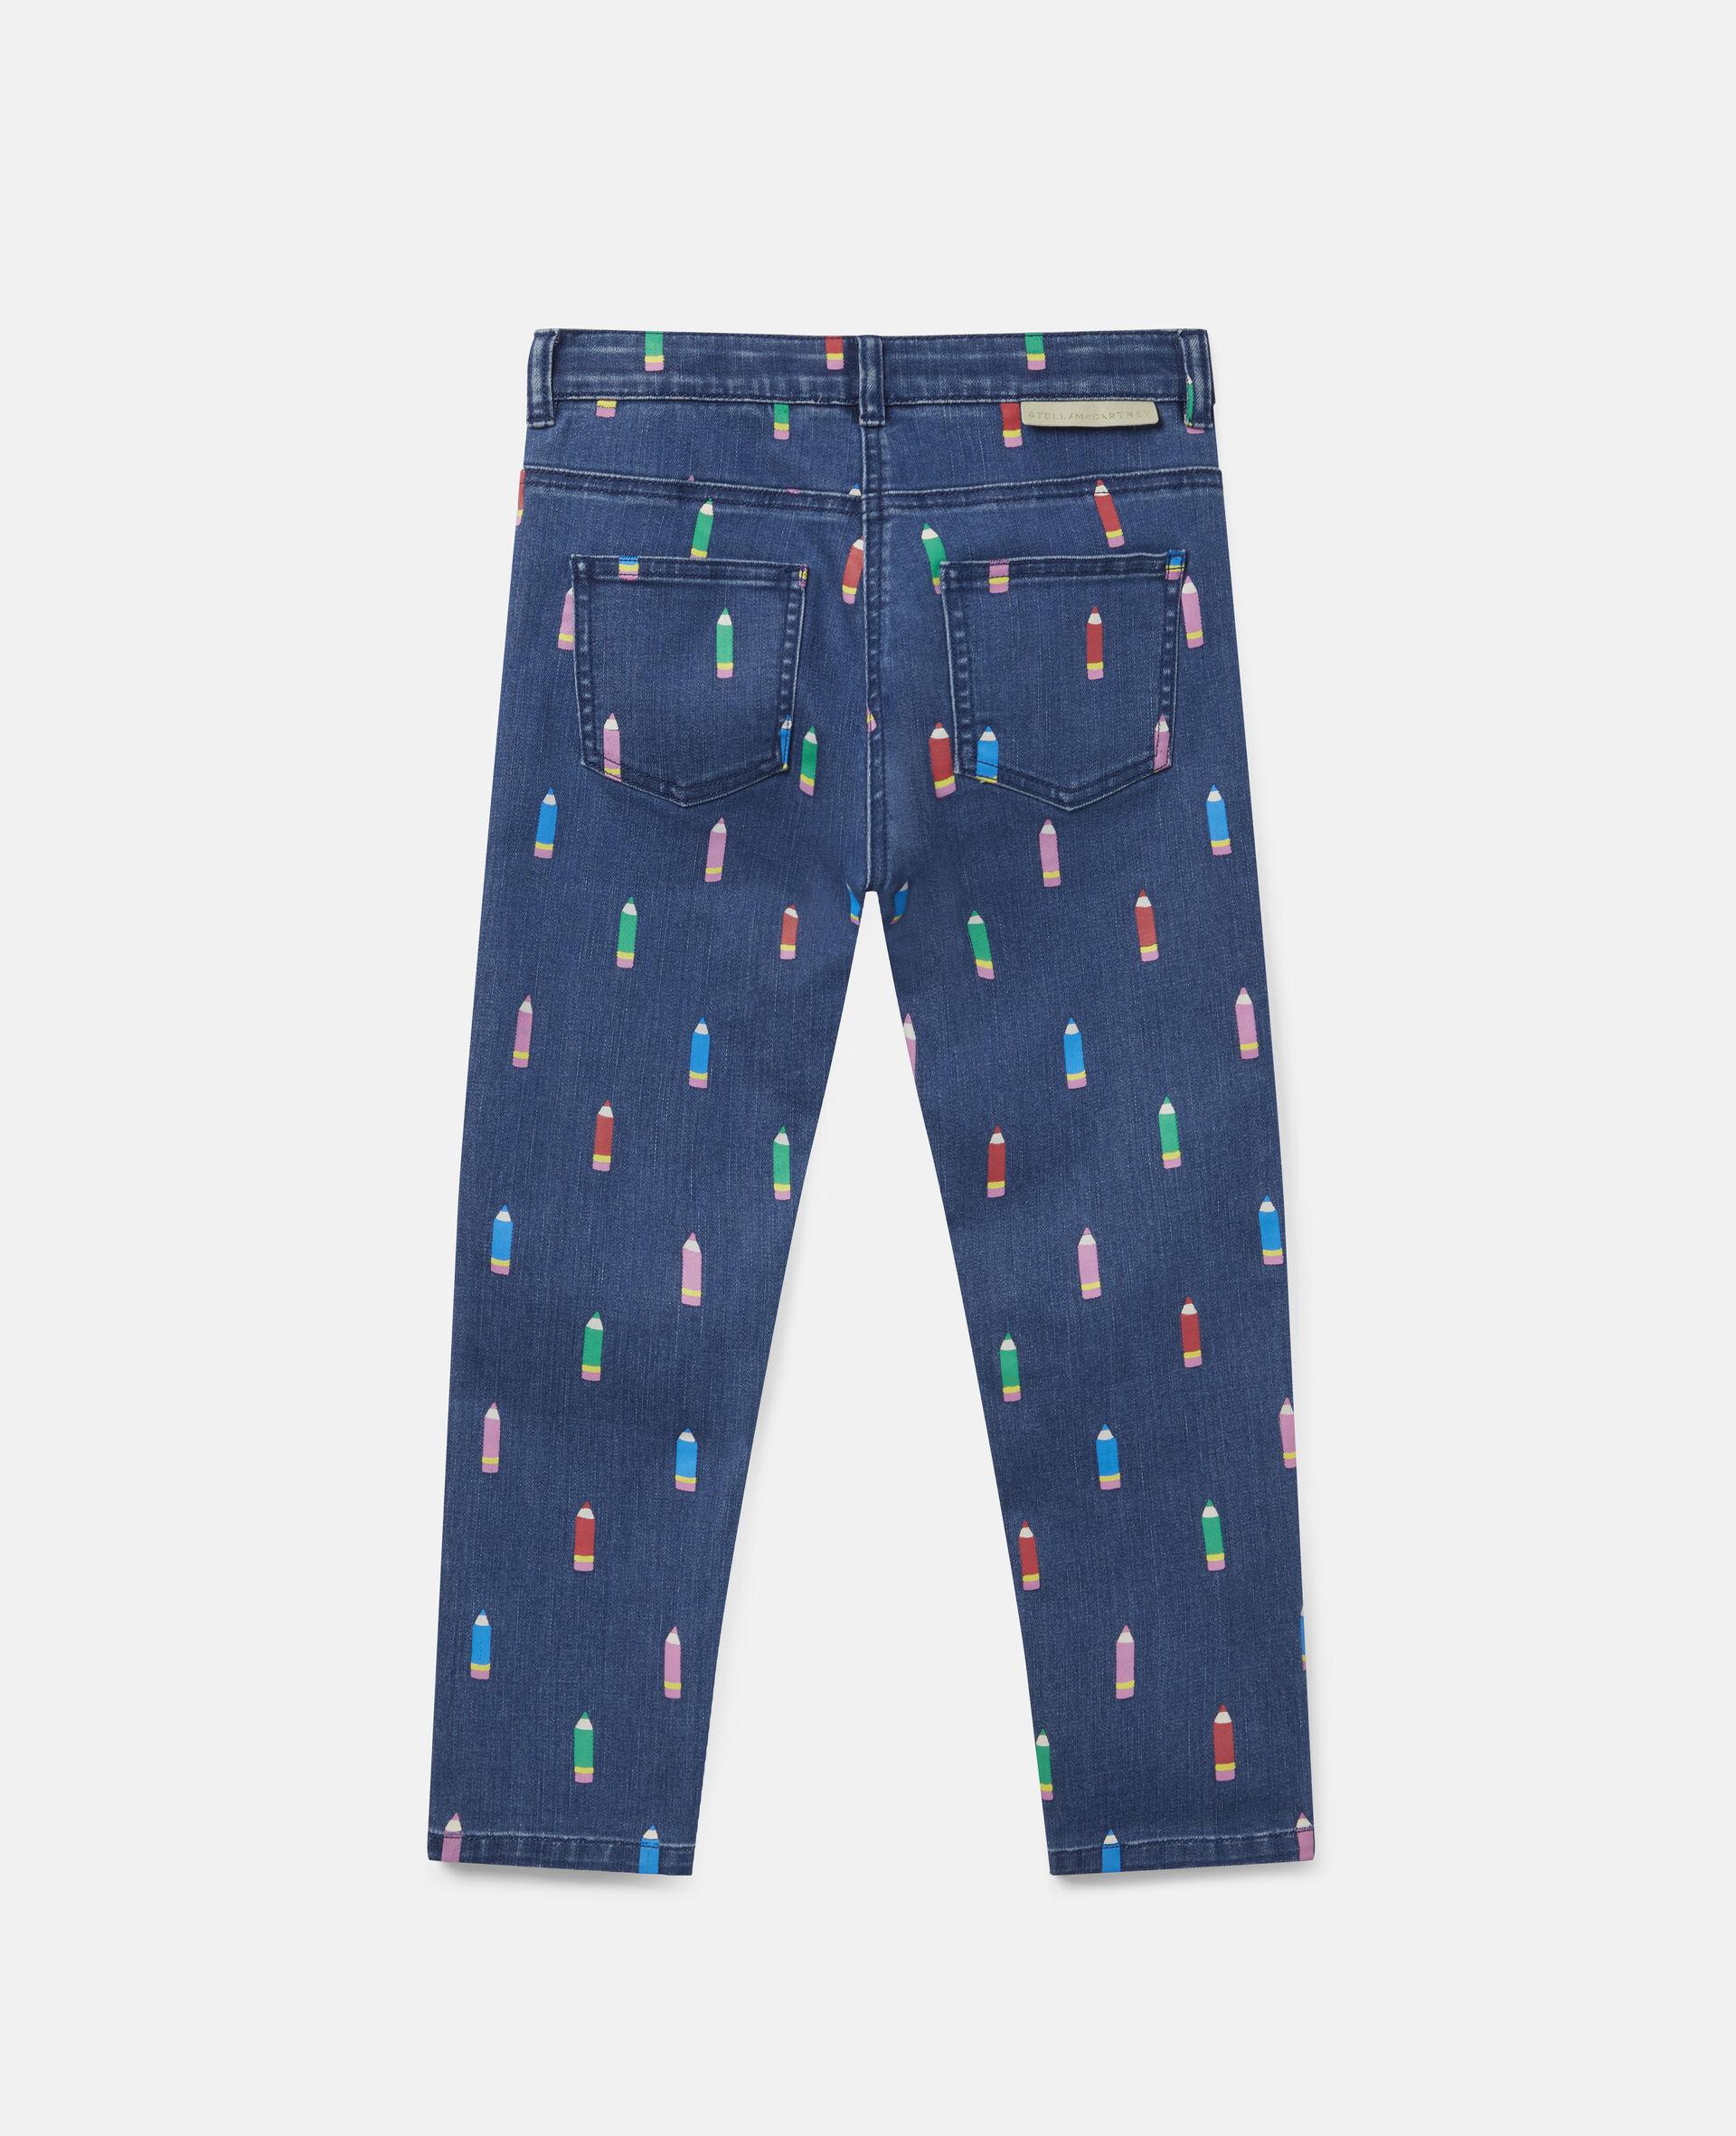 Pencils Denim Trousers-Blue-large image number 3